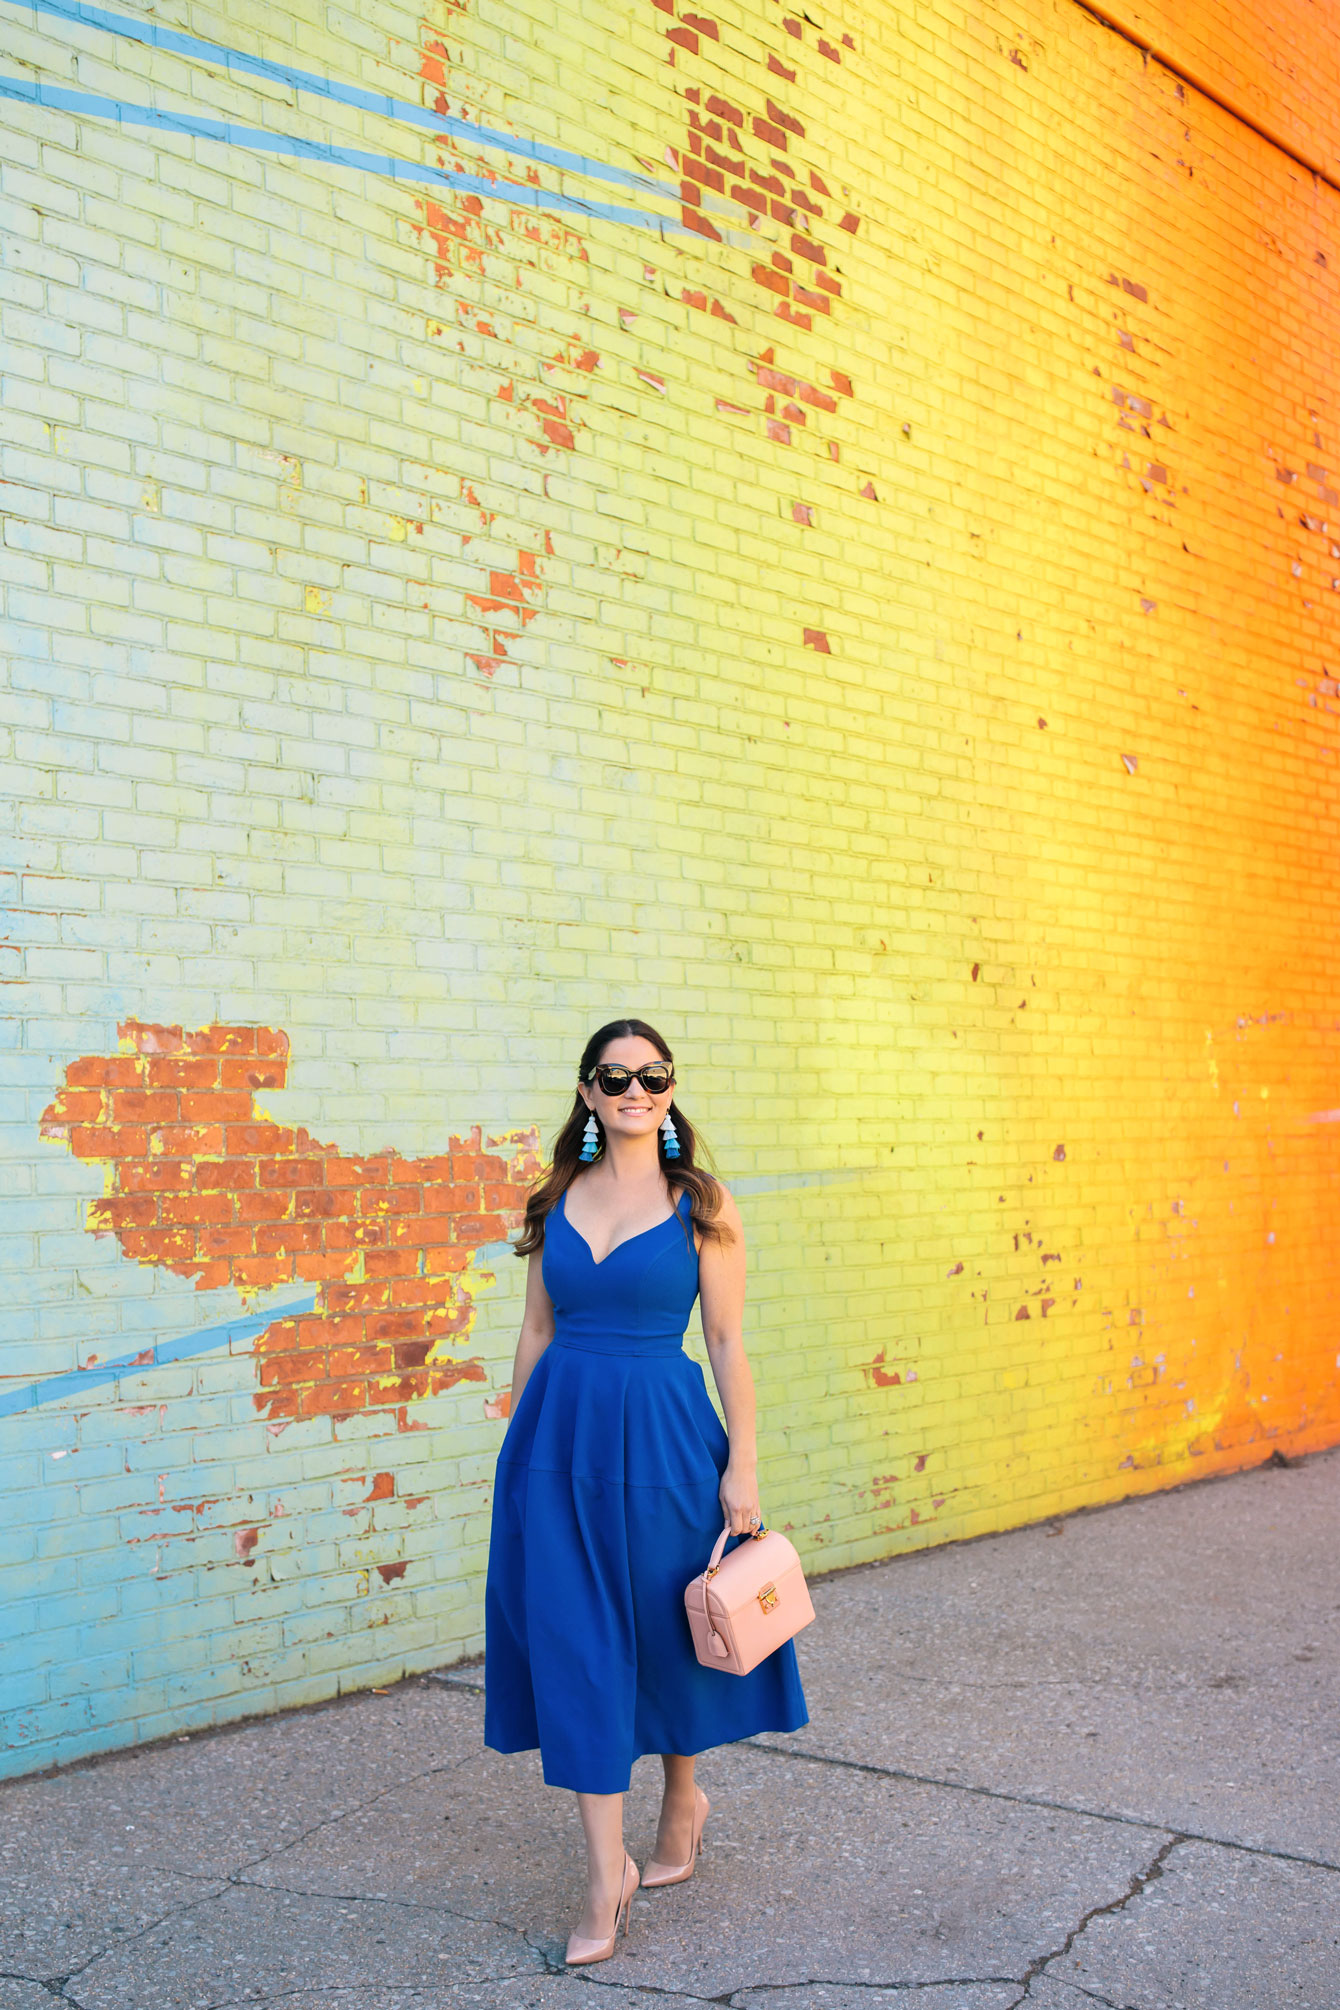 Colorful DUMBO Mural